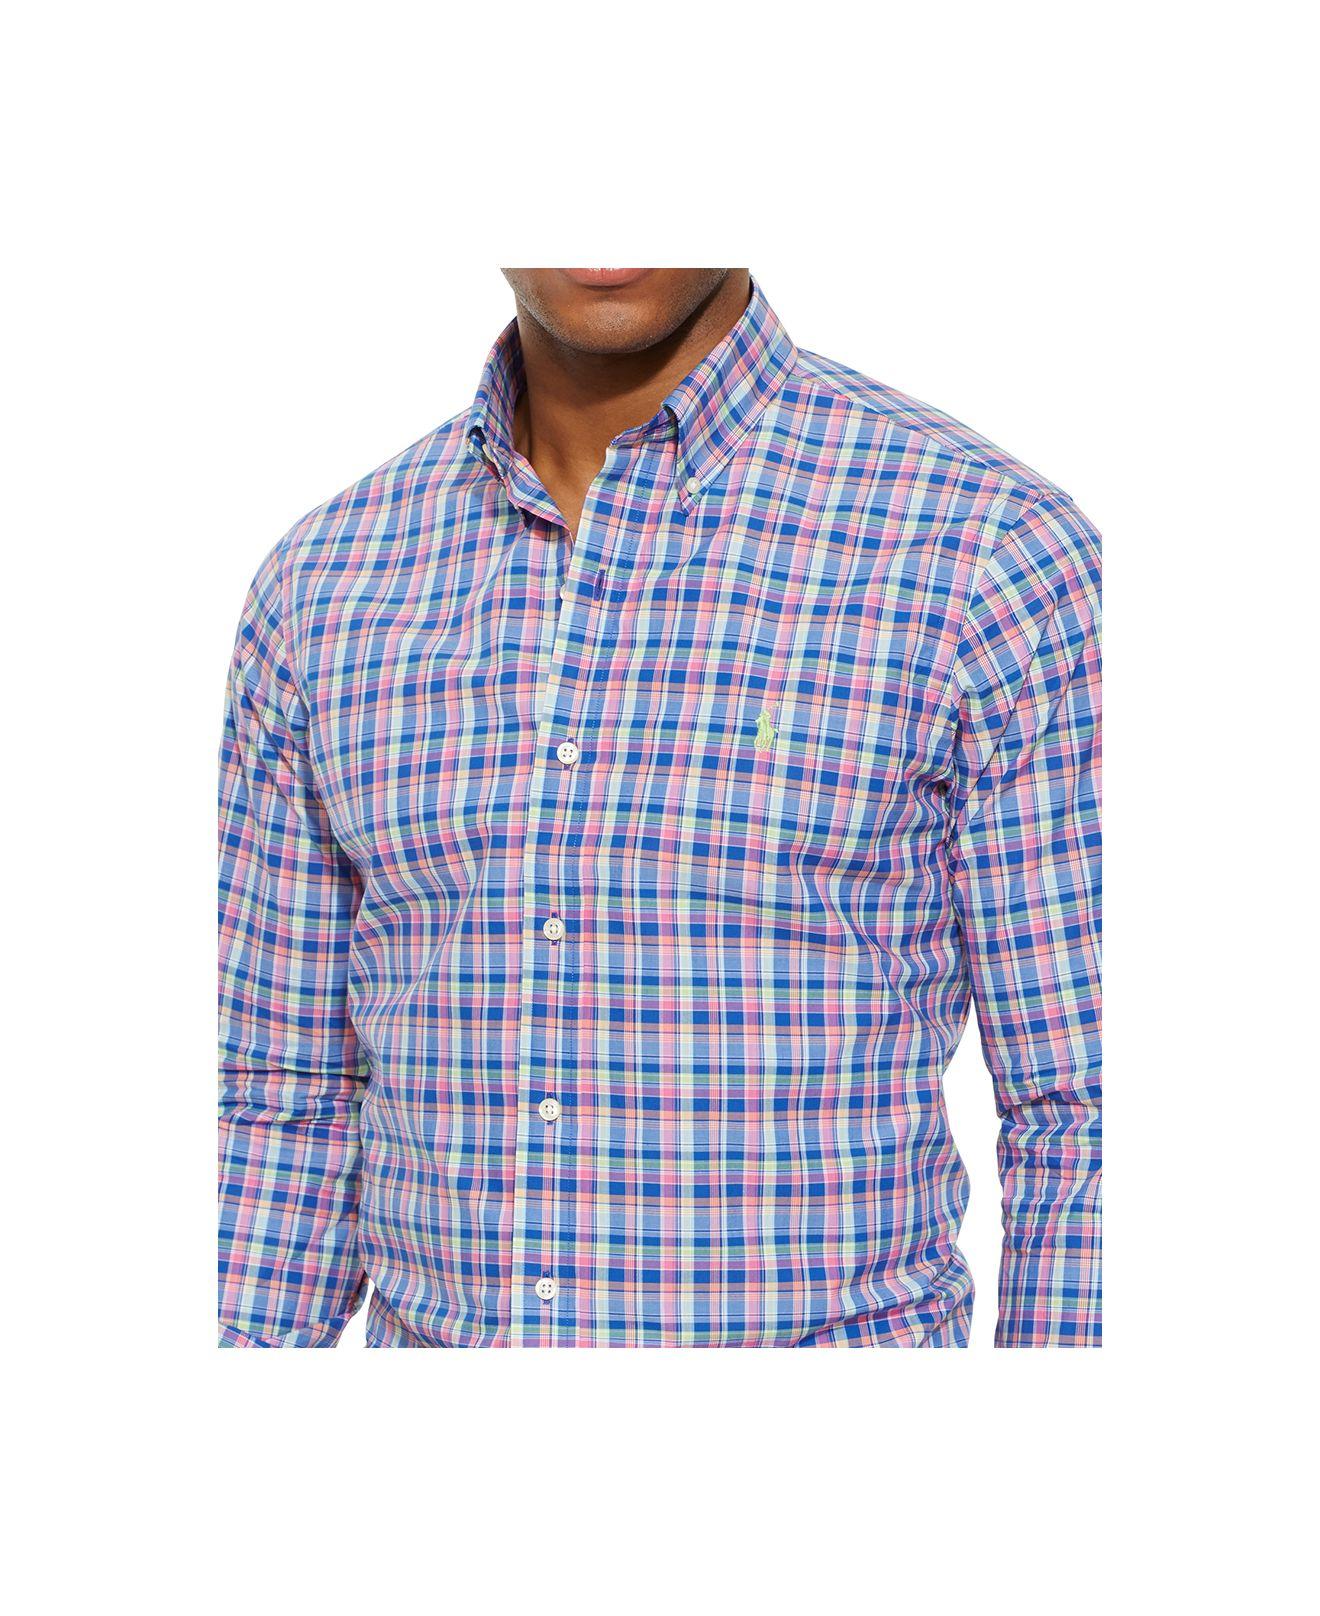 Gallery - Polo Ralph Lauren Plaid Poplin Shirt In Pink For Men Lyst